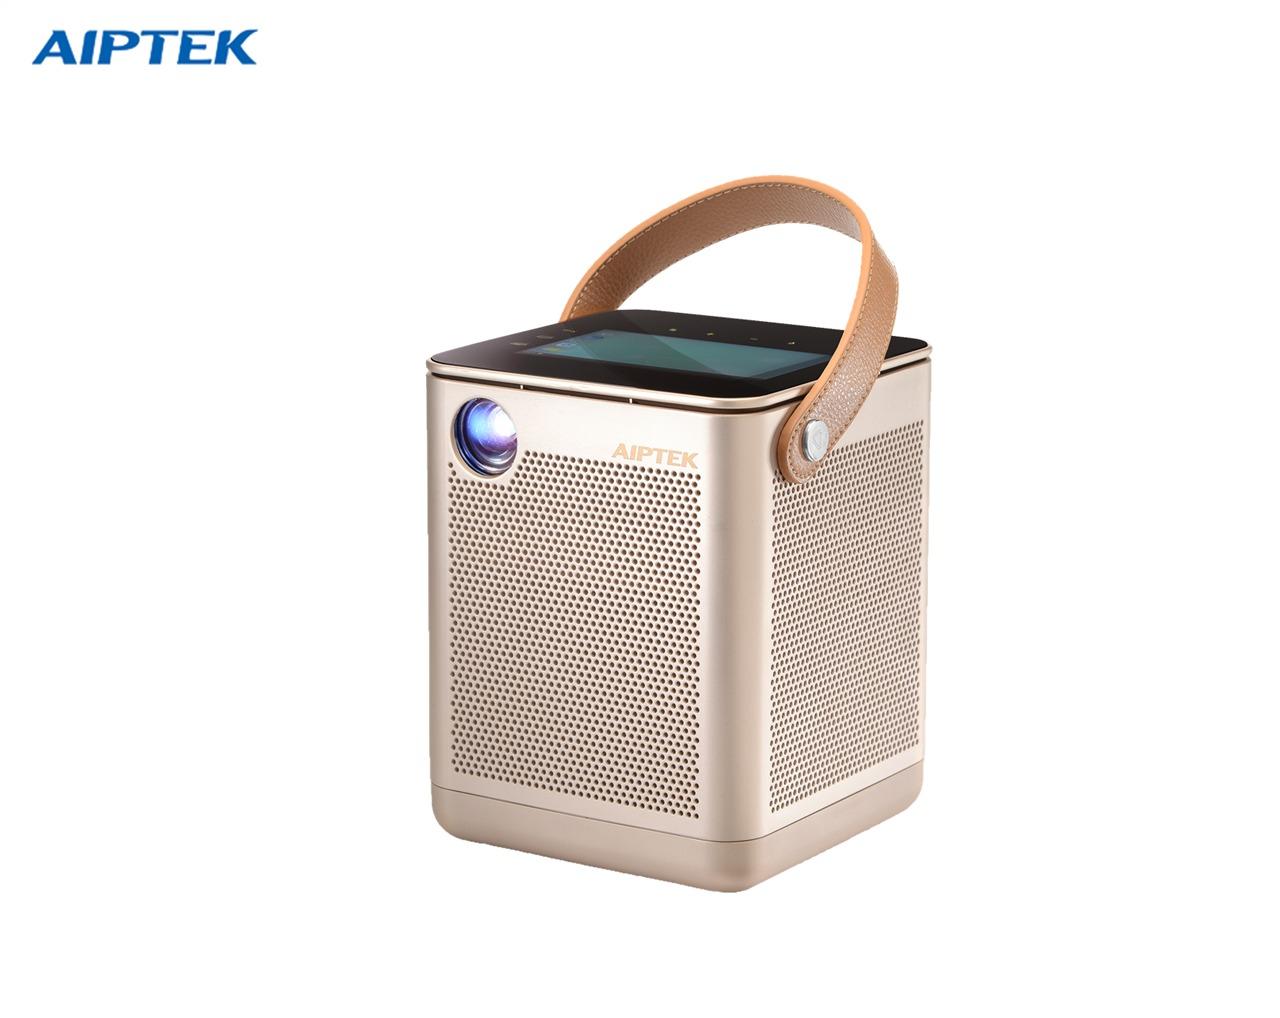 Aiptek Boombox P800 1